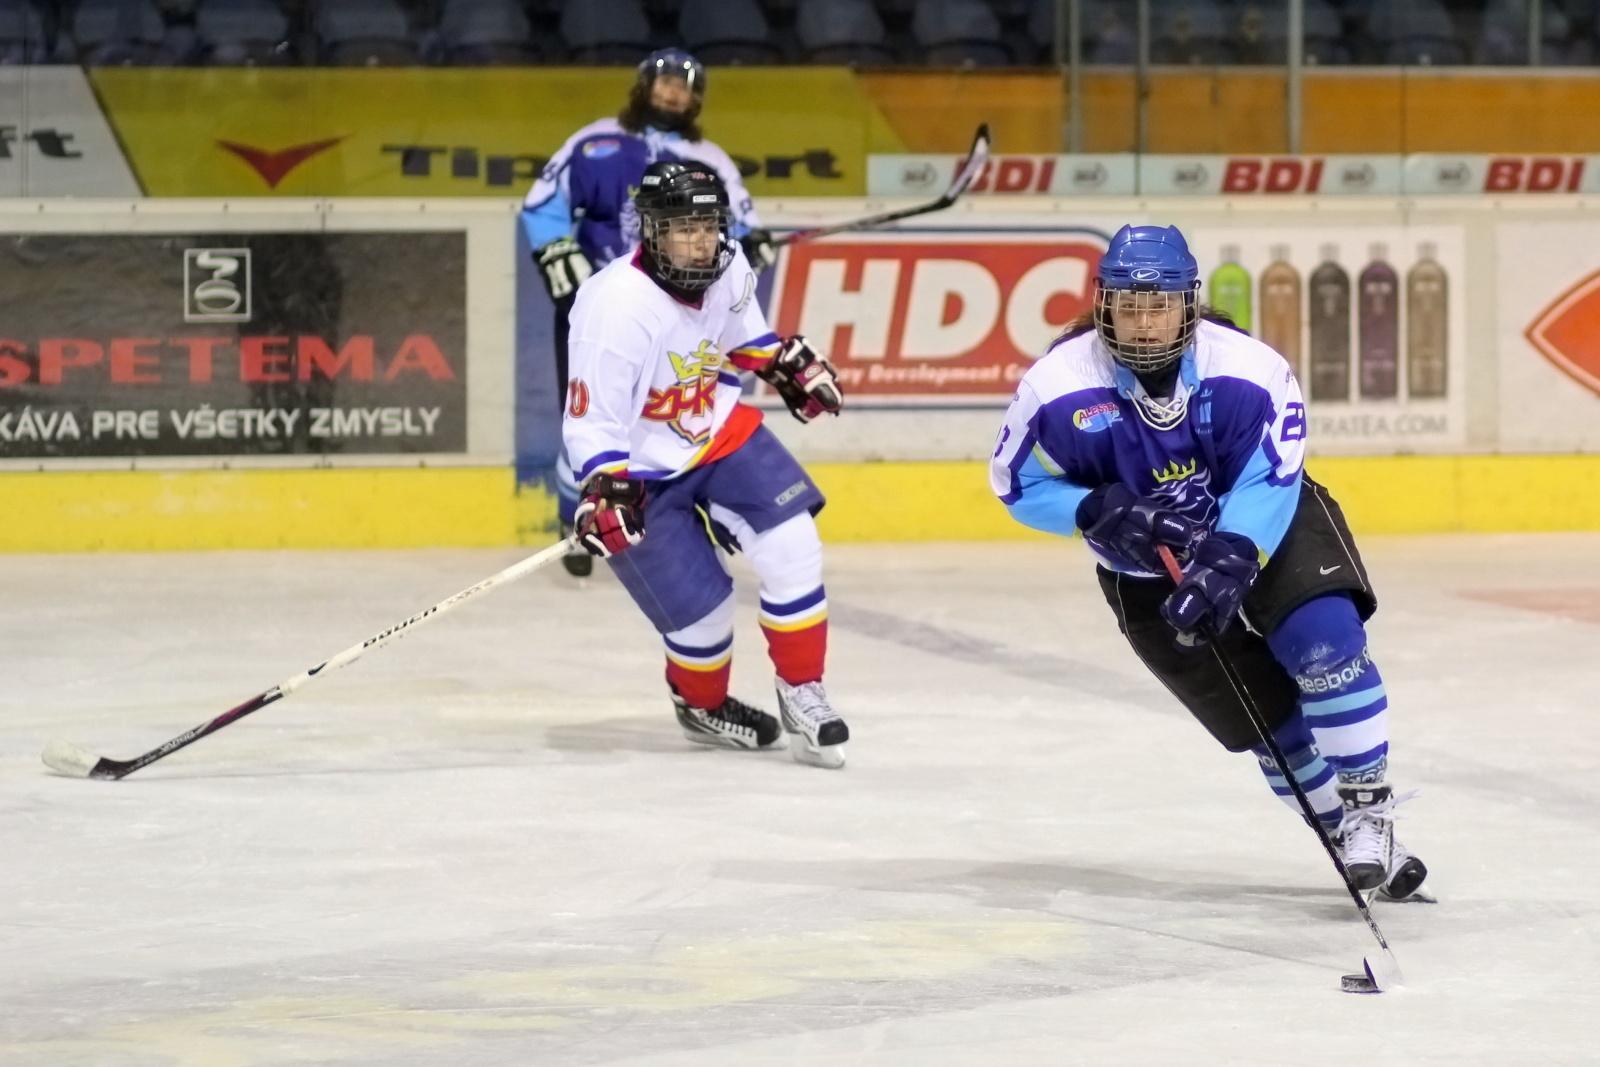 zhkm-zvolen-martin-hokej-2011-13